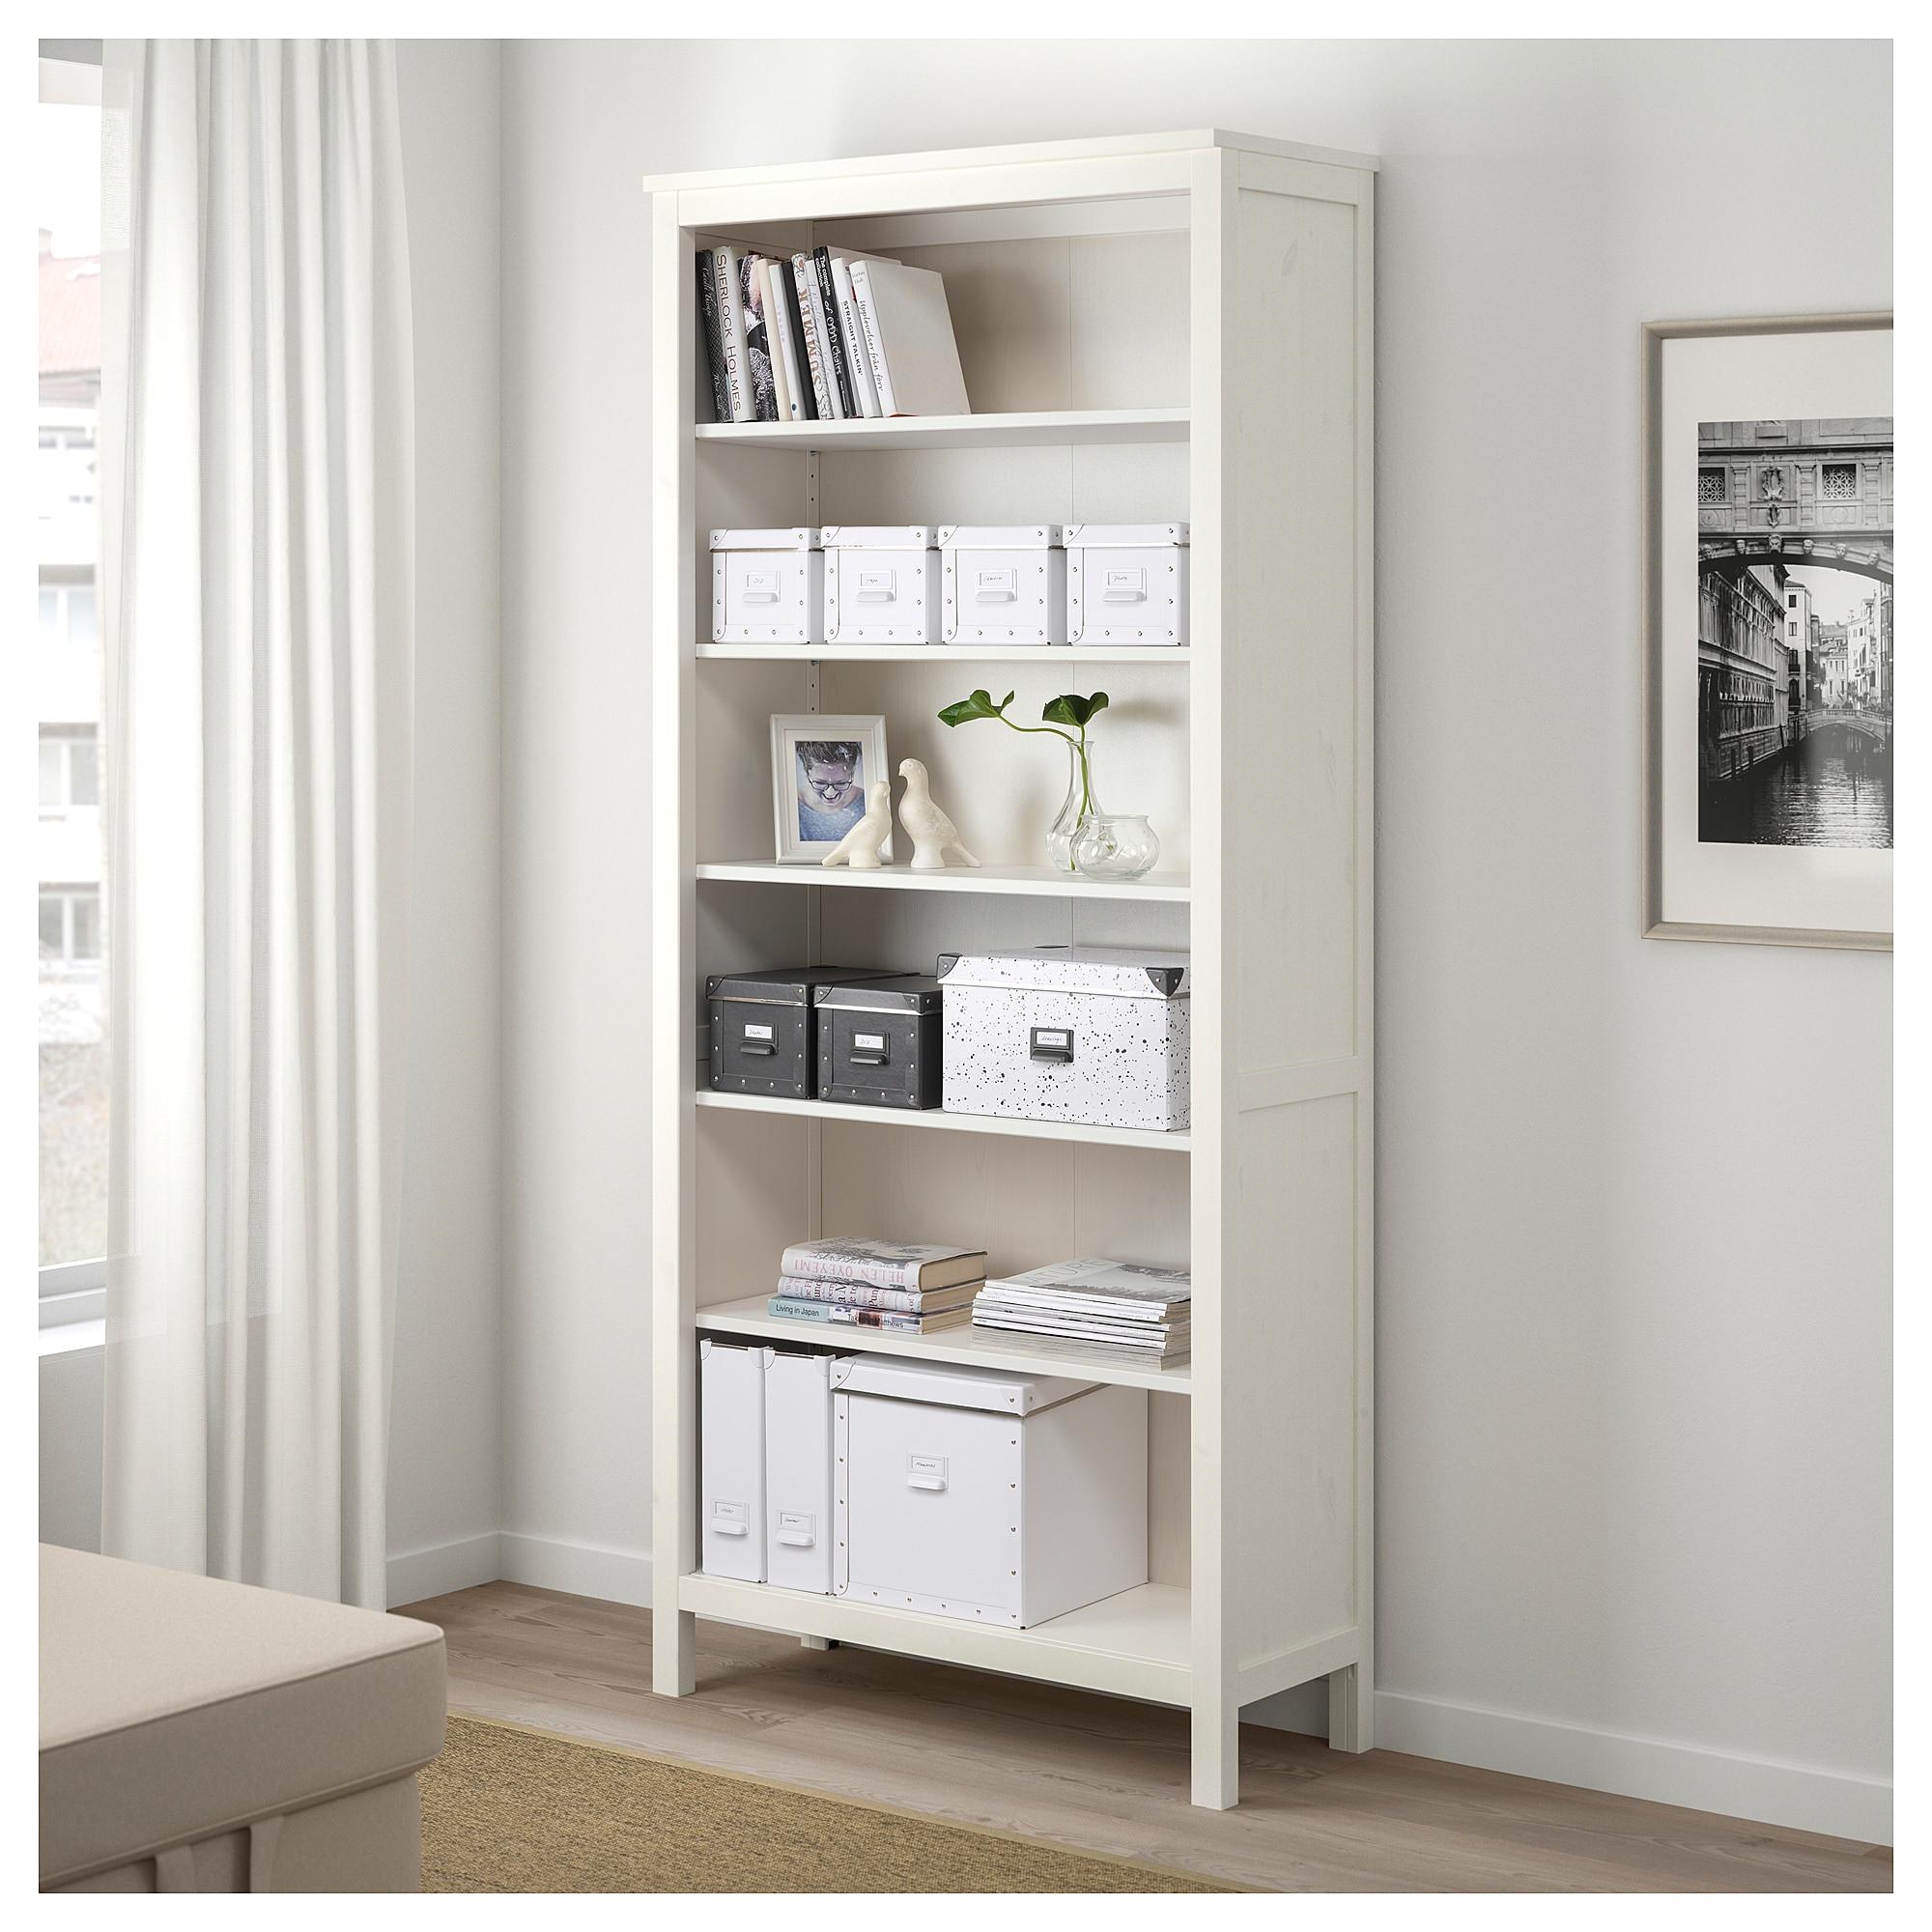 kitchen shelves kitchen with open shelves kitchen cabinet pull out shelves home depot kitchen top shelves